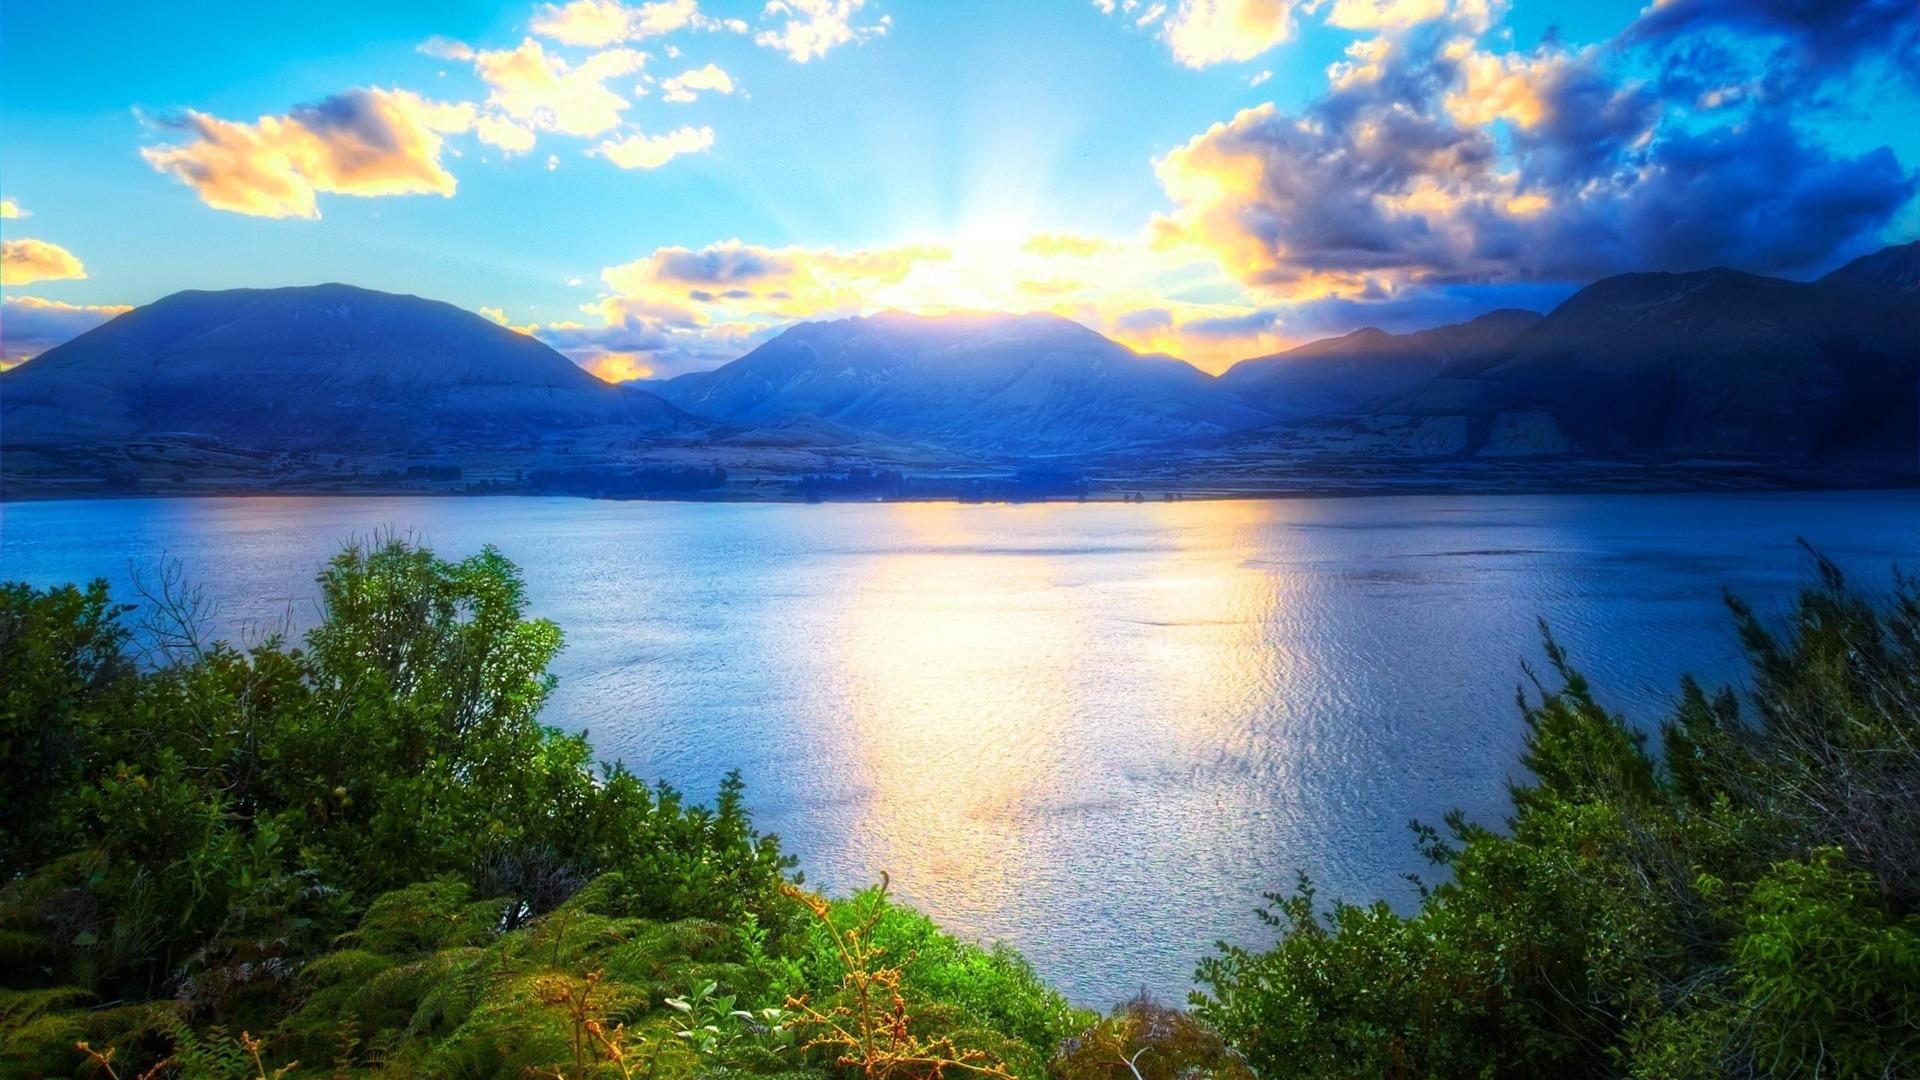 Mountains Sun Light Clouds Vegetation Natural Scenery Hd